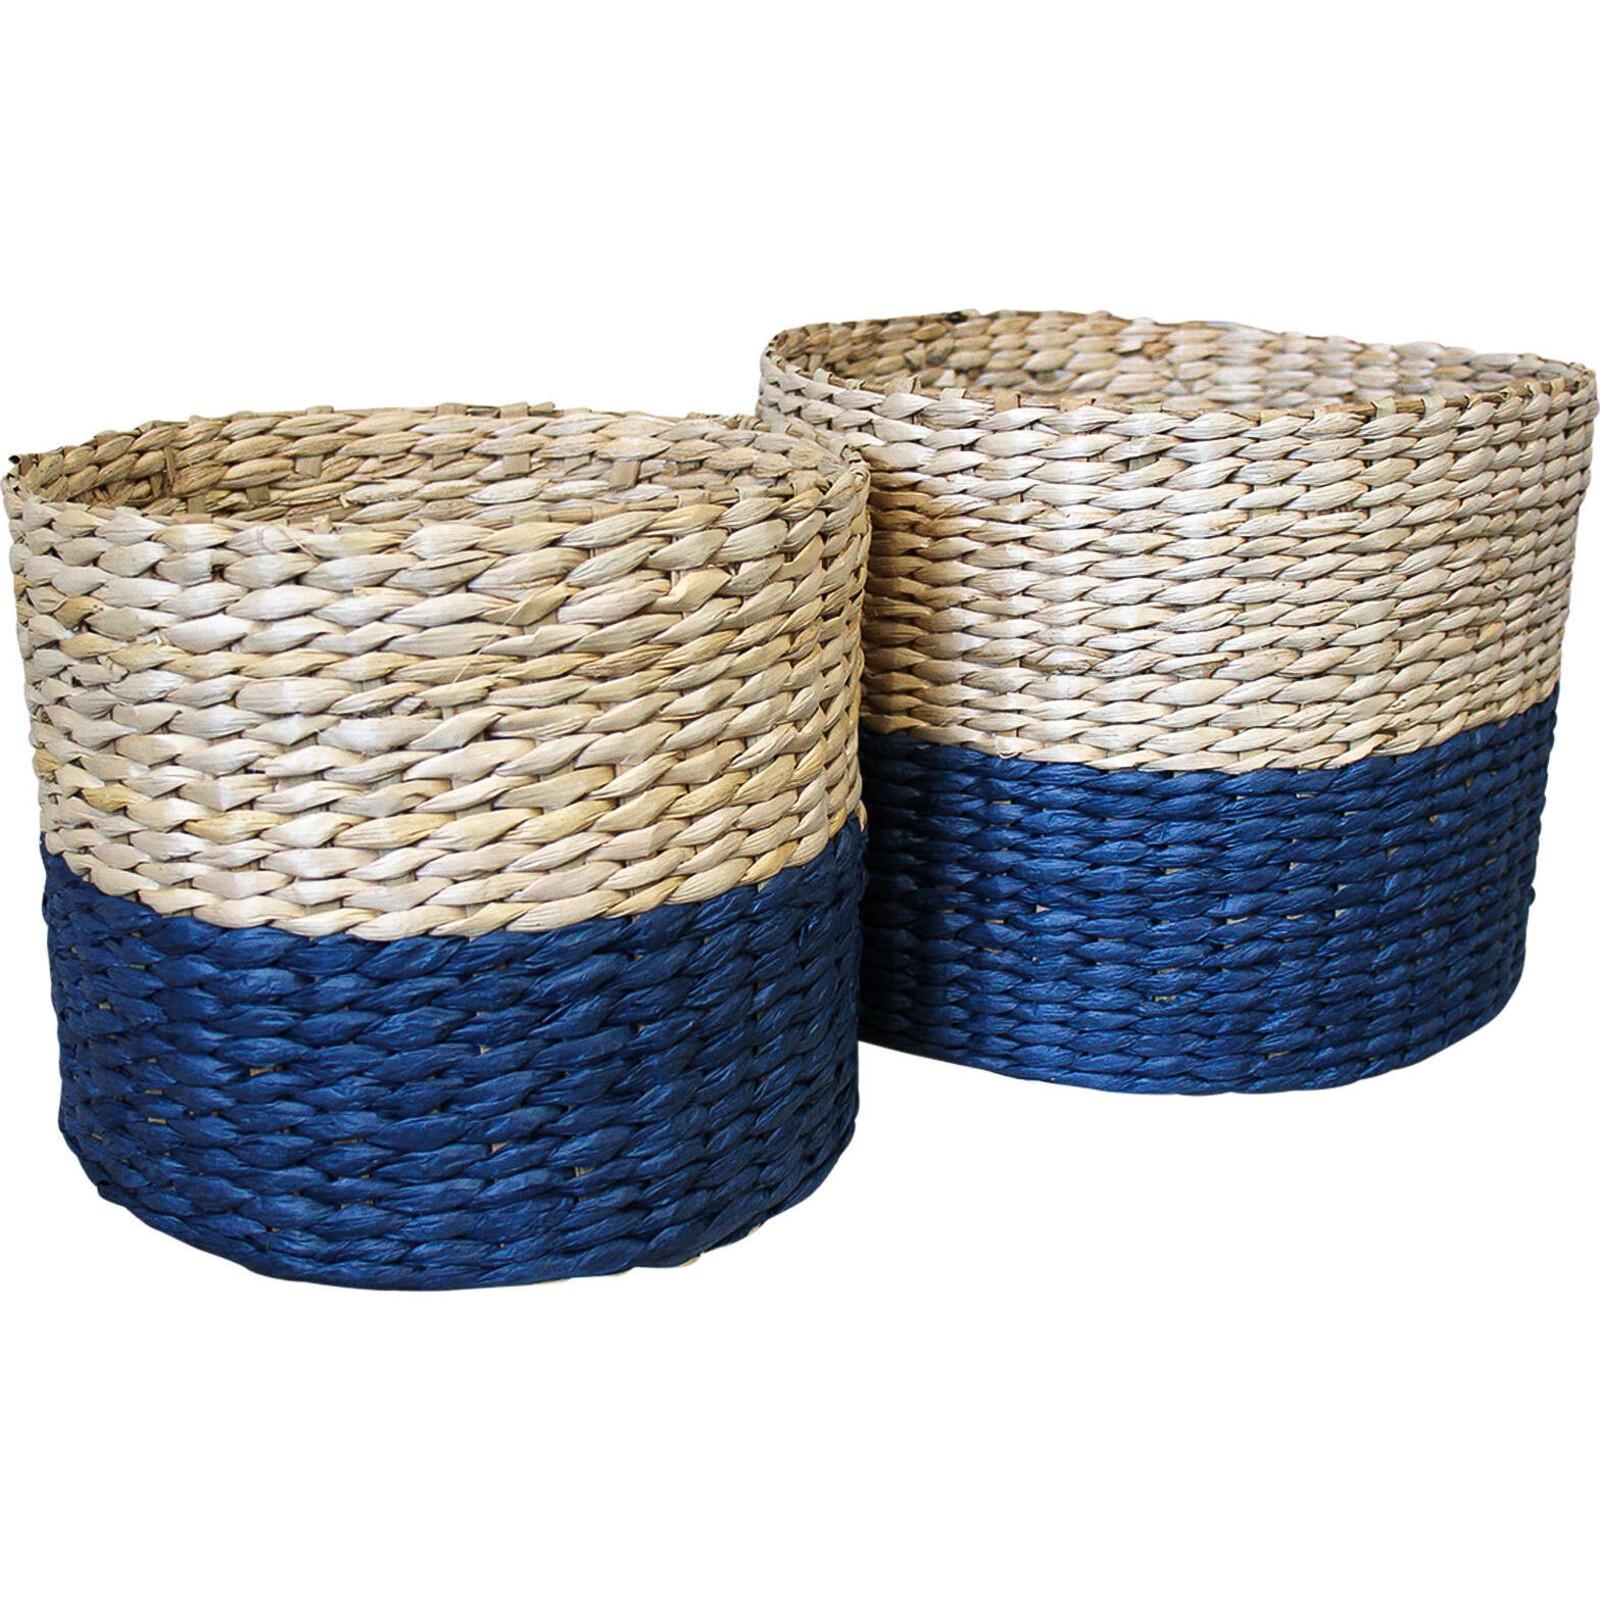 Basket Woven Tub Navy S/2